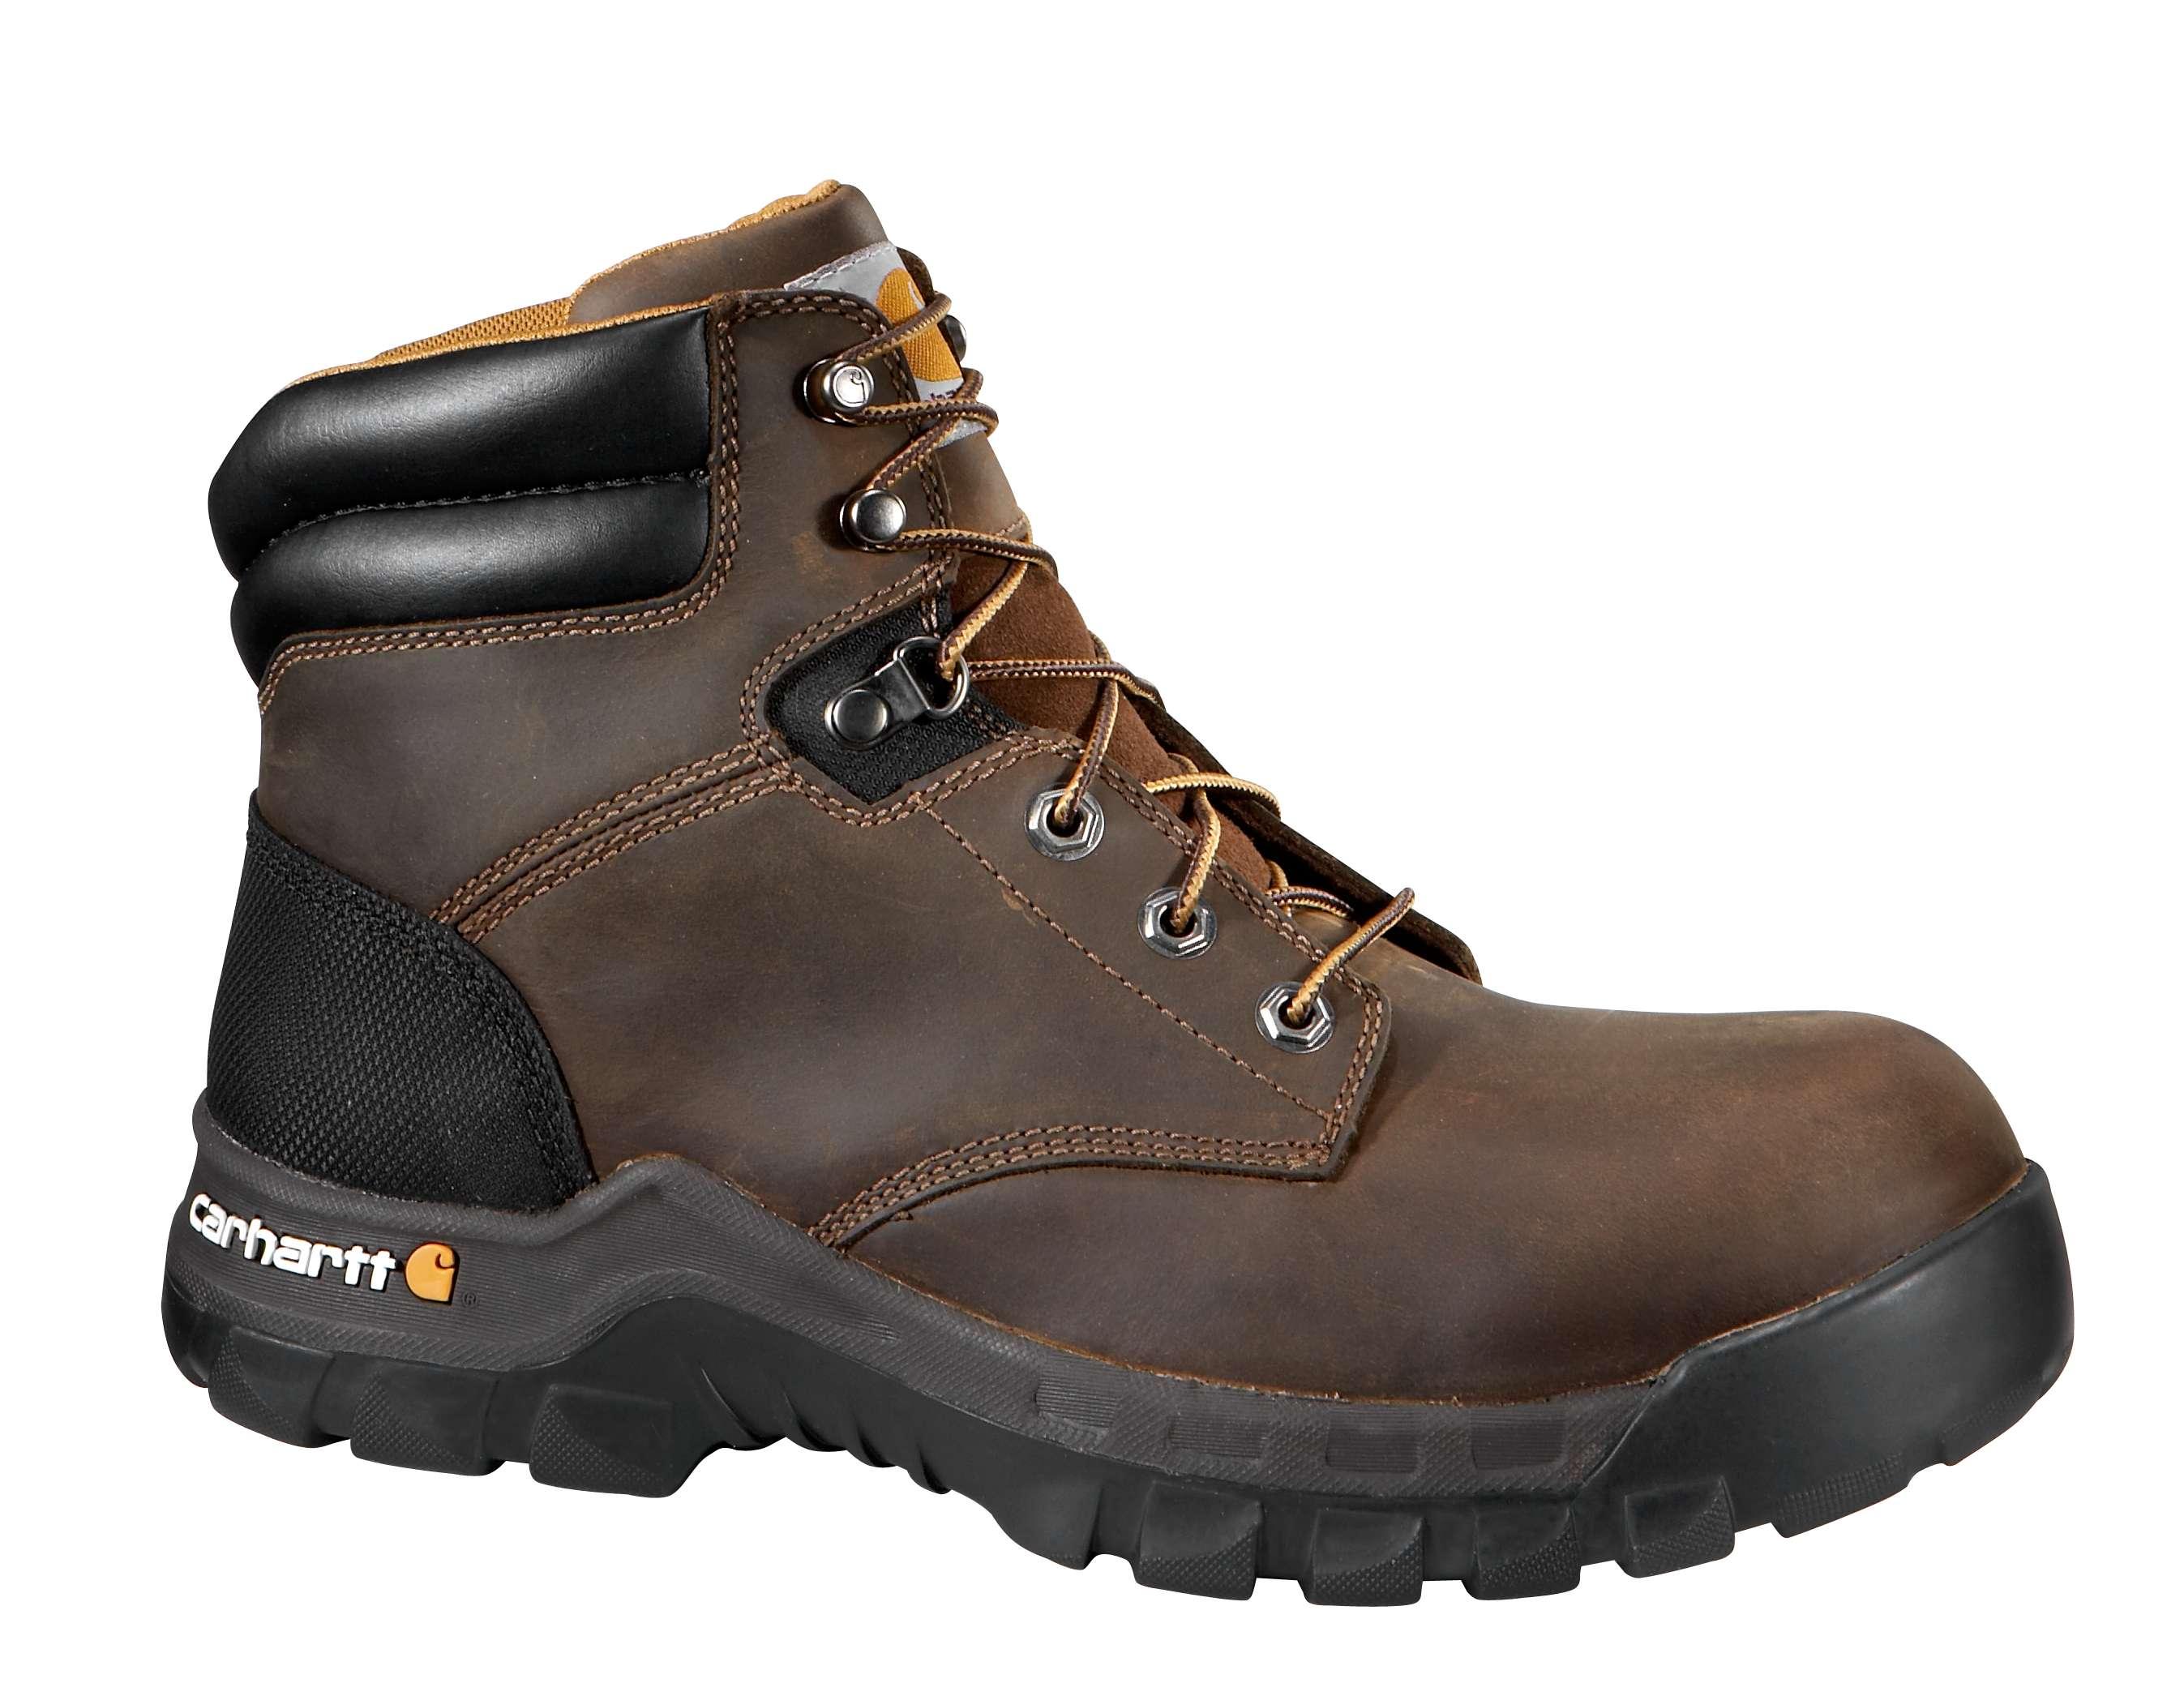 Carhartt Rugged Flex 6-Inch Composite Toe Work Boot